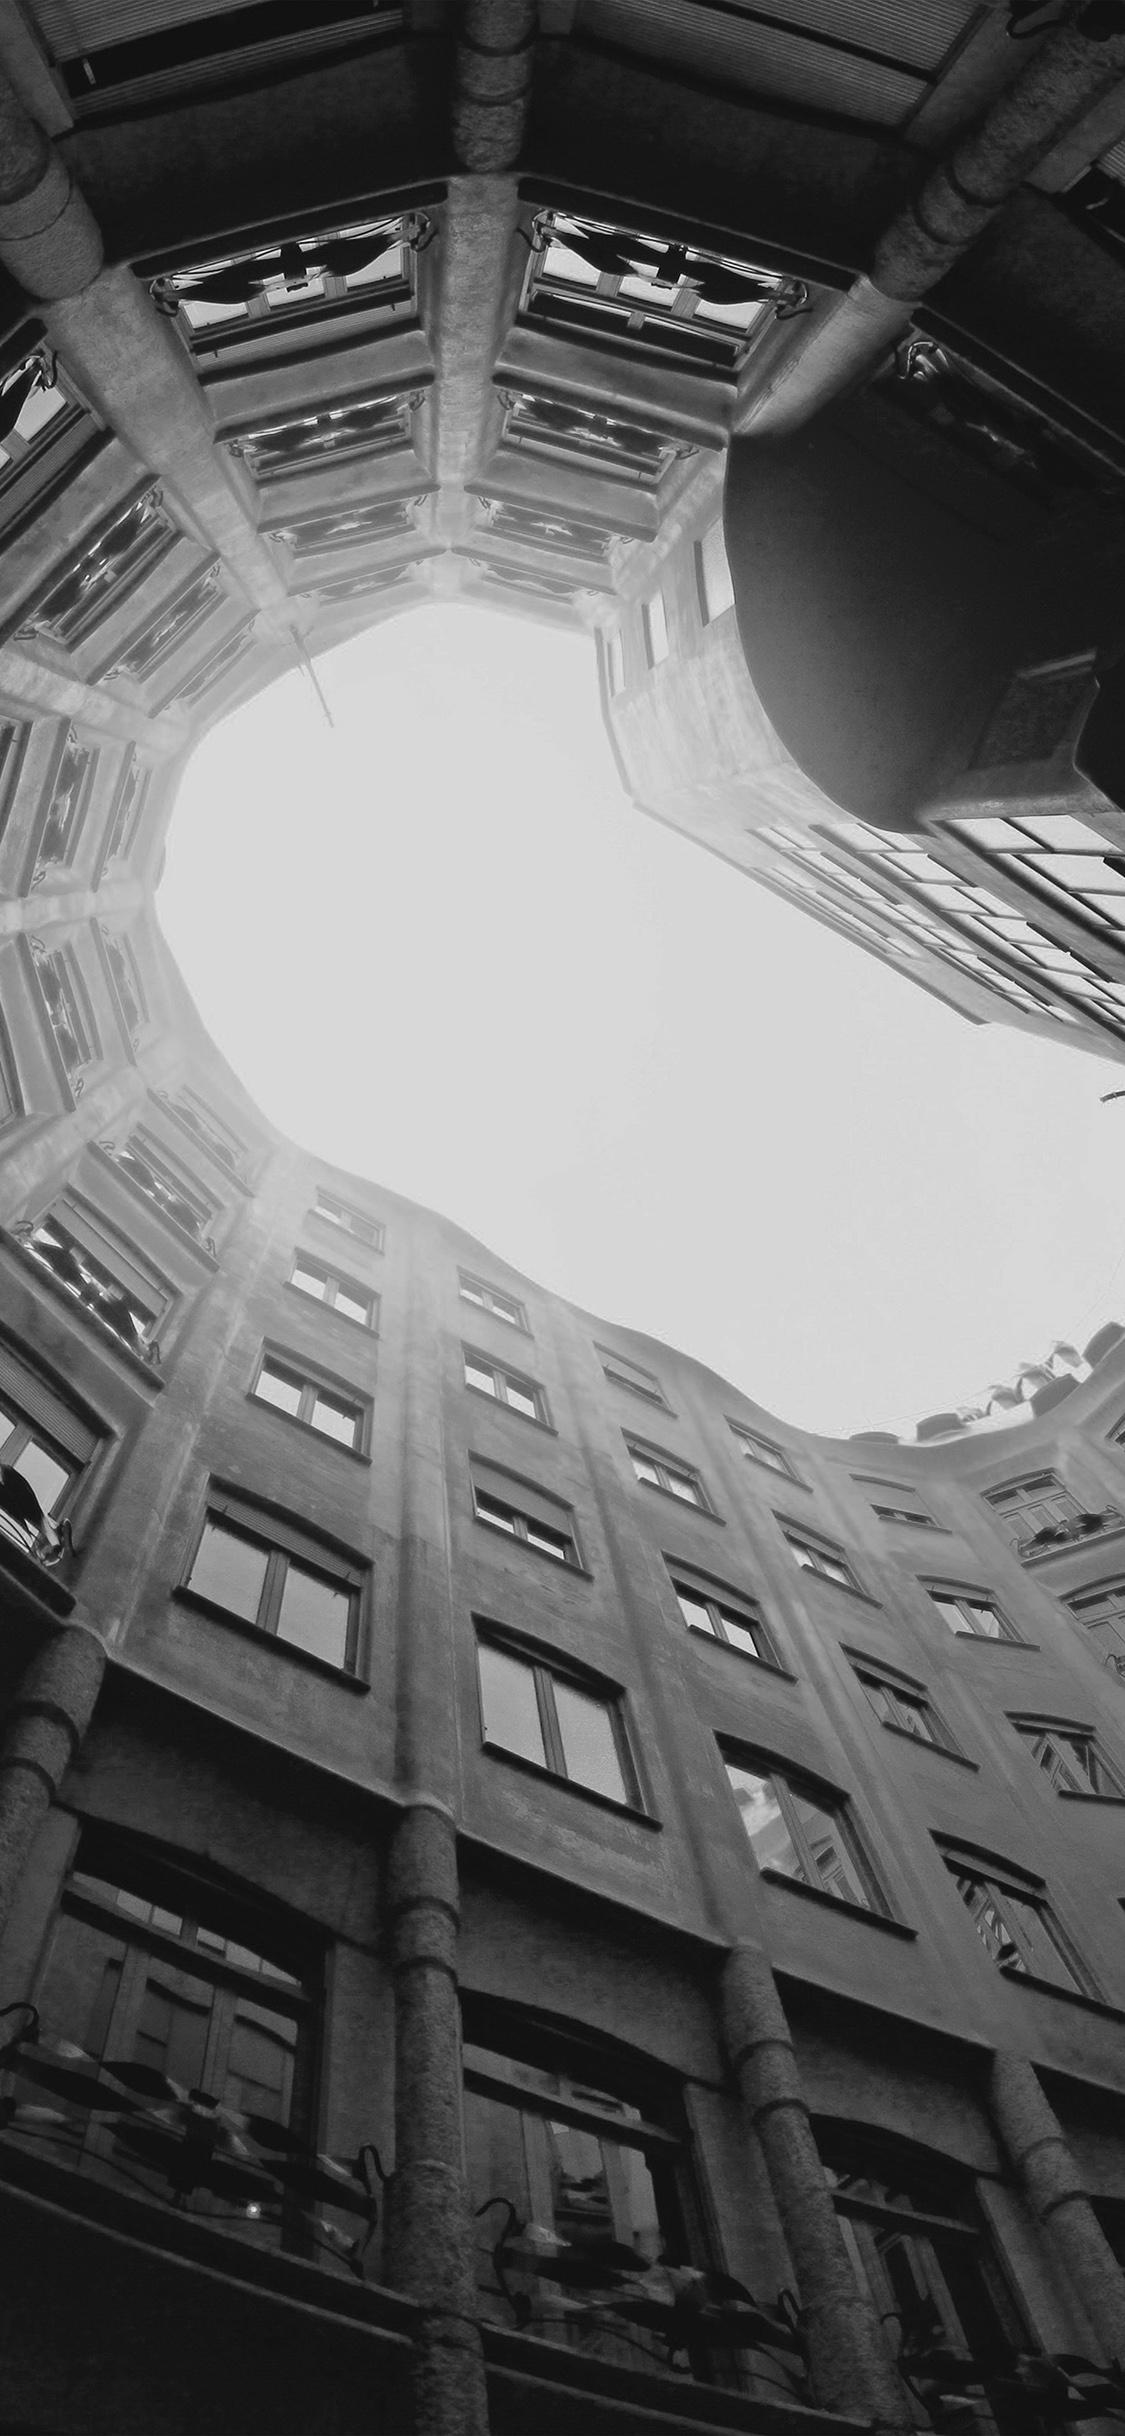 iPhonexpapers.com-Apple-iPhone-wallpaper-mz53-architecture-art-building-center-city-dark-bw